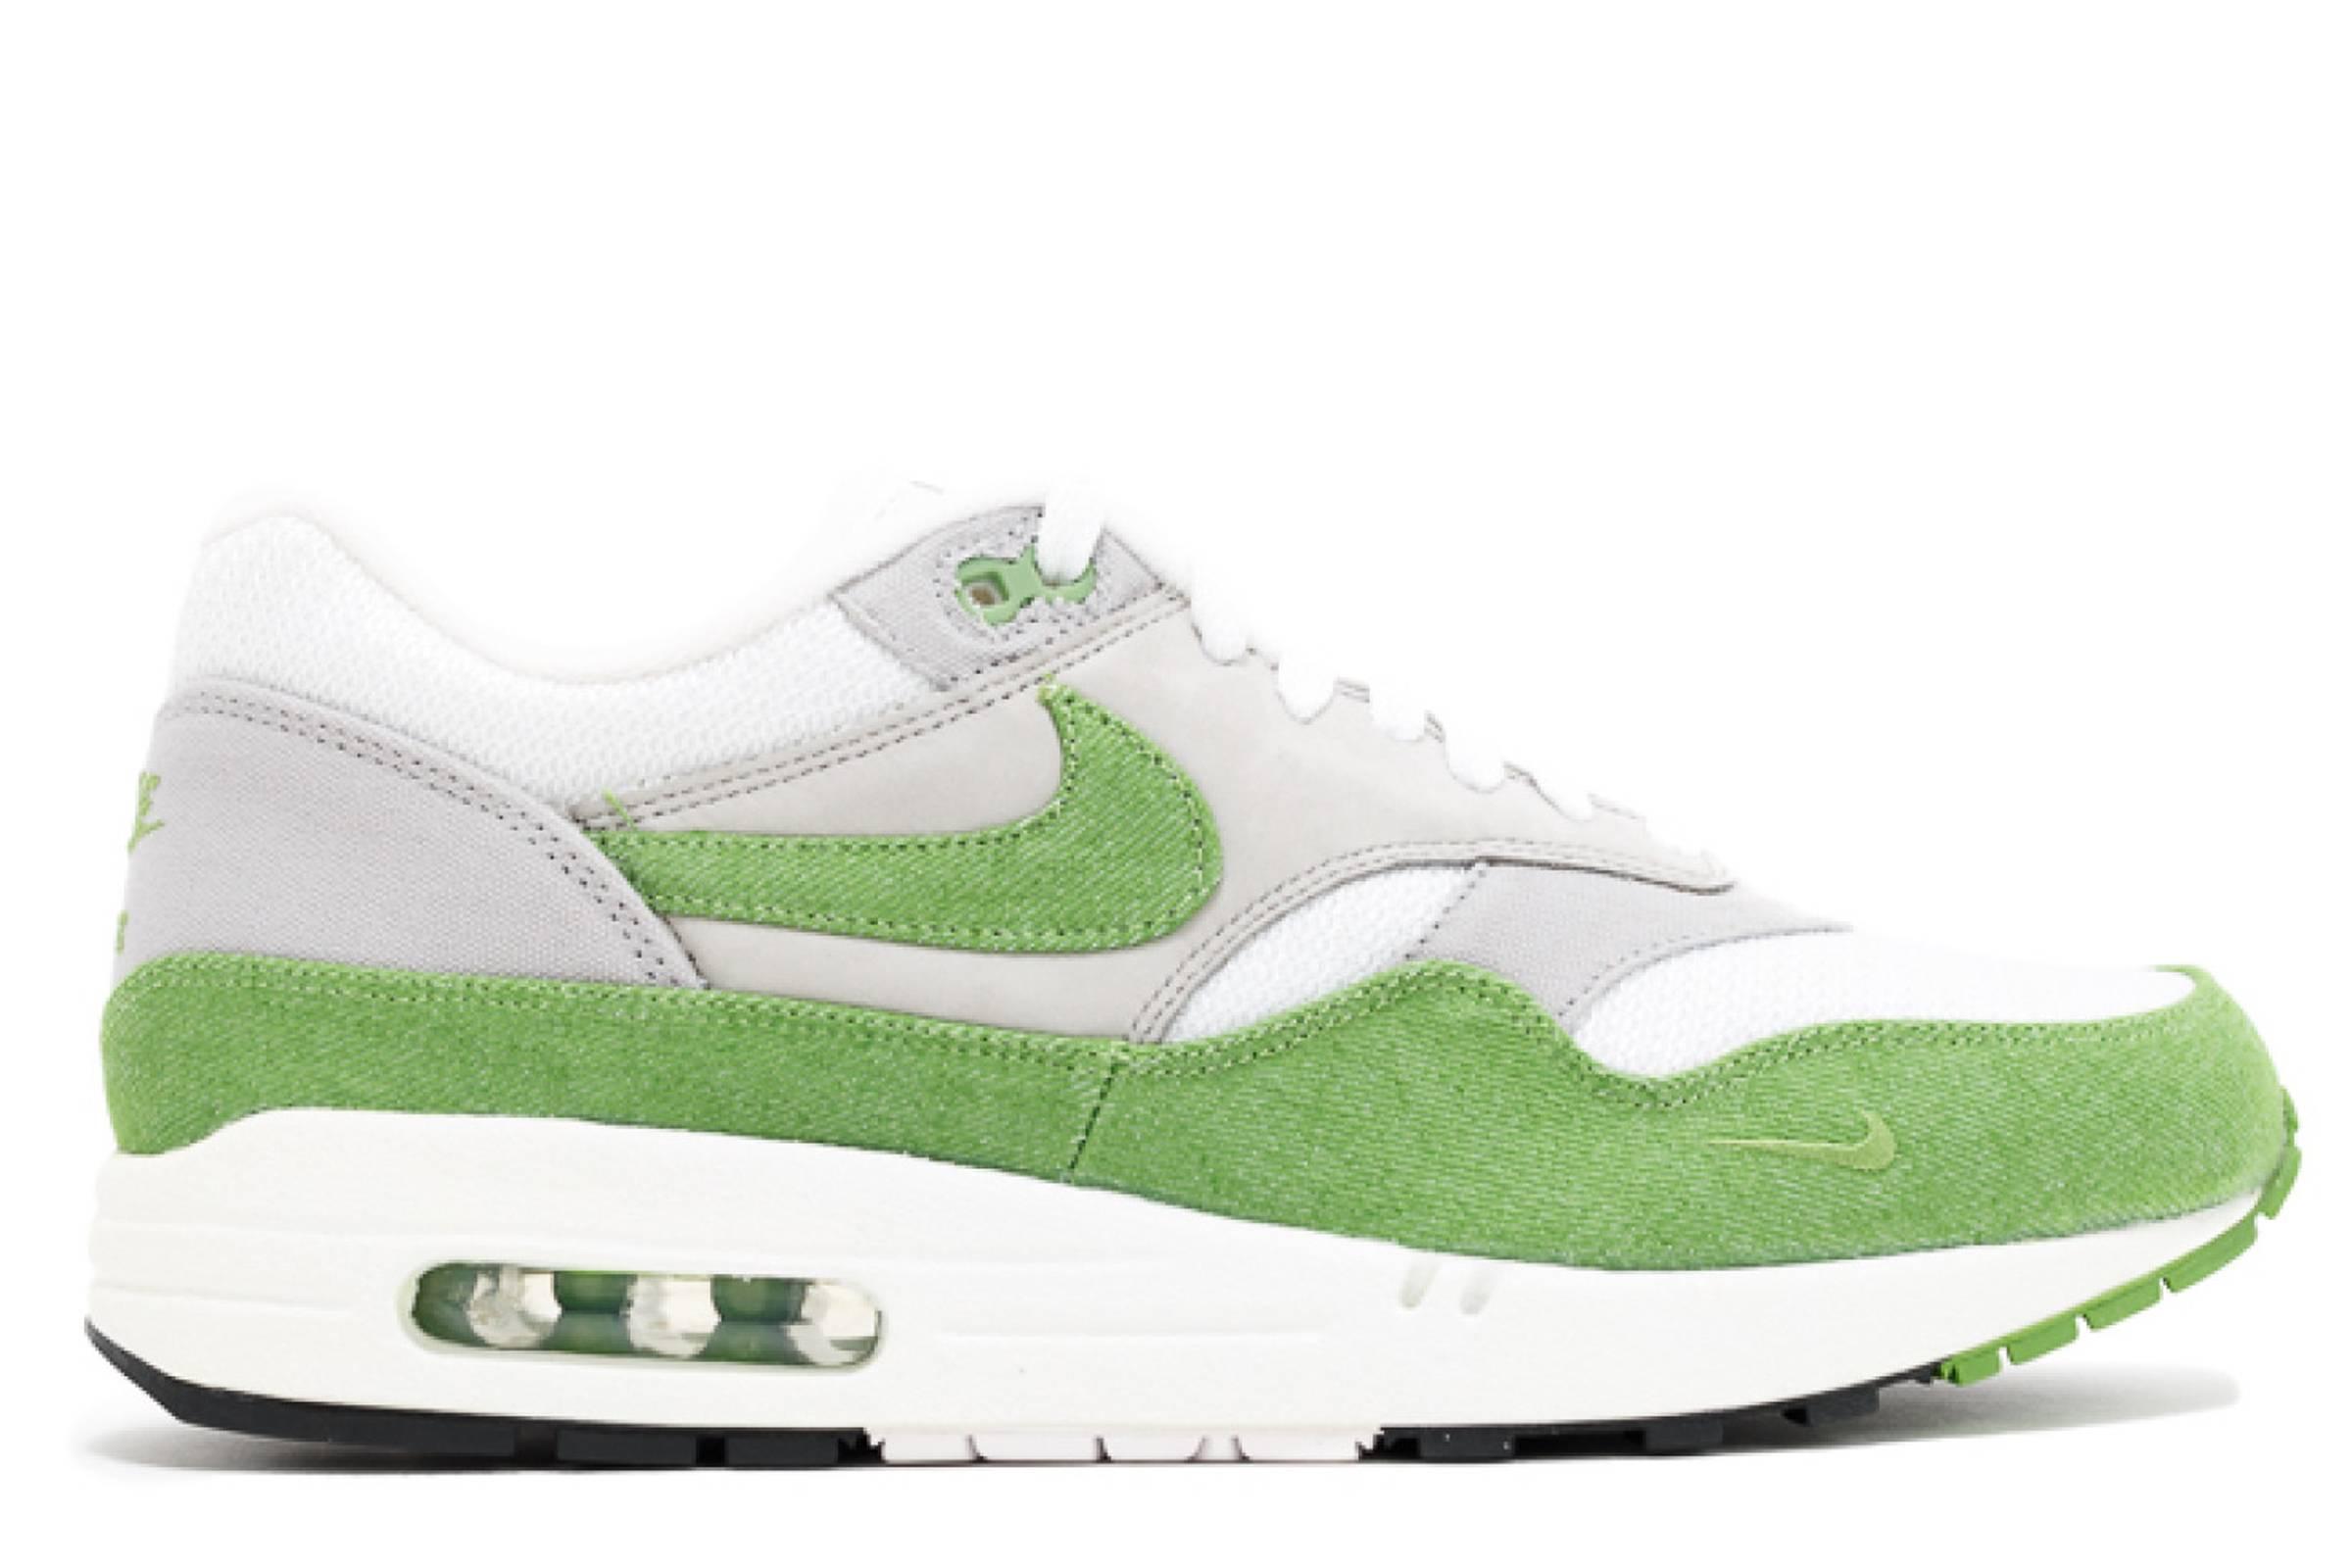 sports shoes a511b 1c2f1 ... Nike x Patta Air Max 1 Chlorophyll (2009) ...